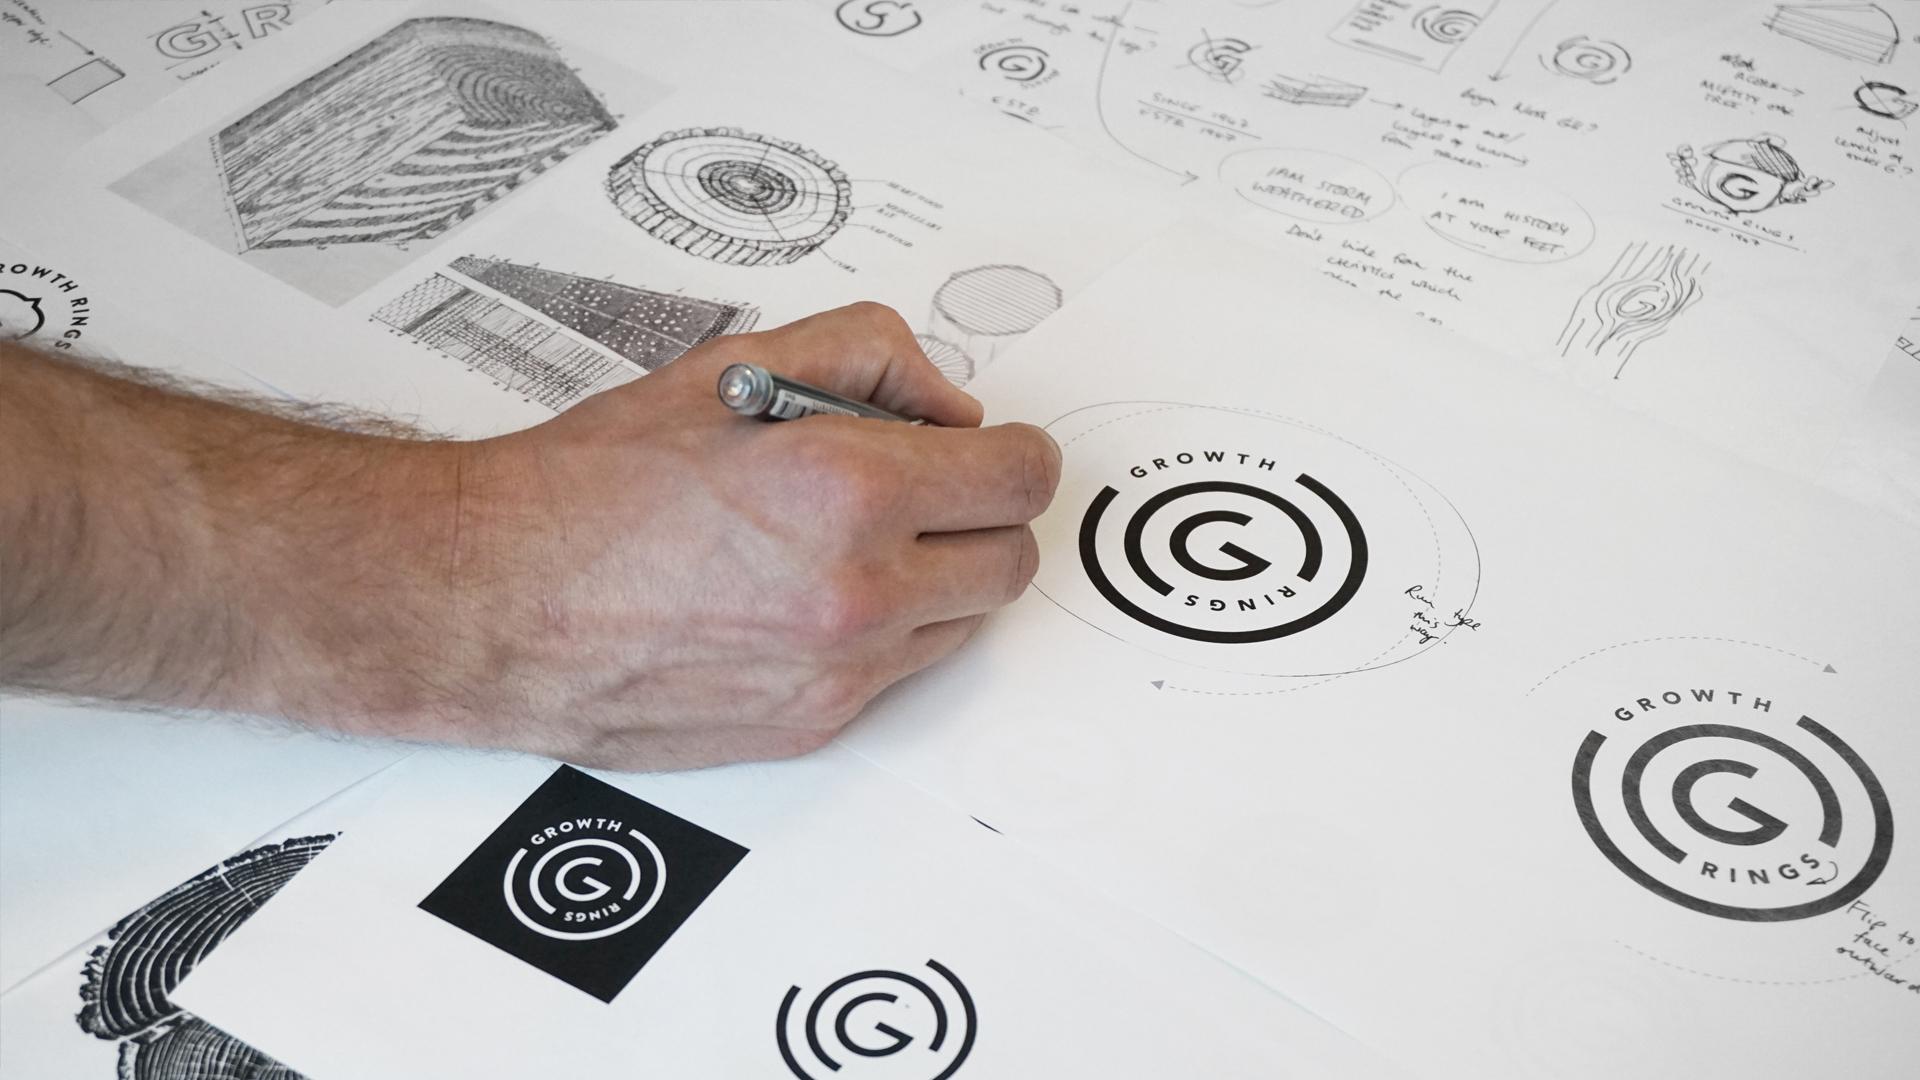 growth_rings_logo_sketch